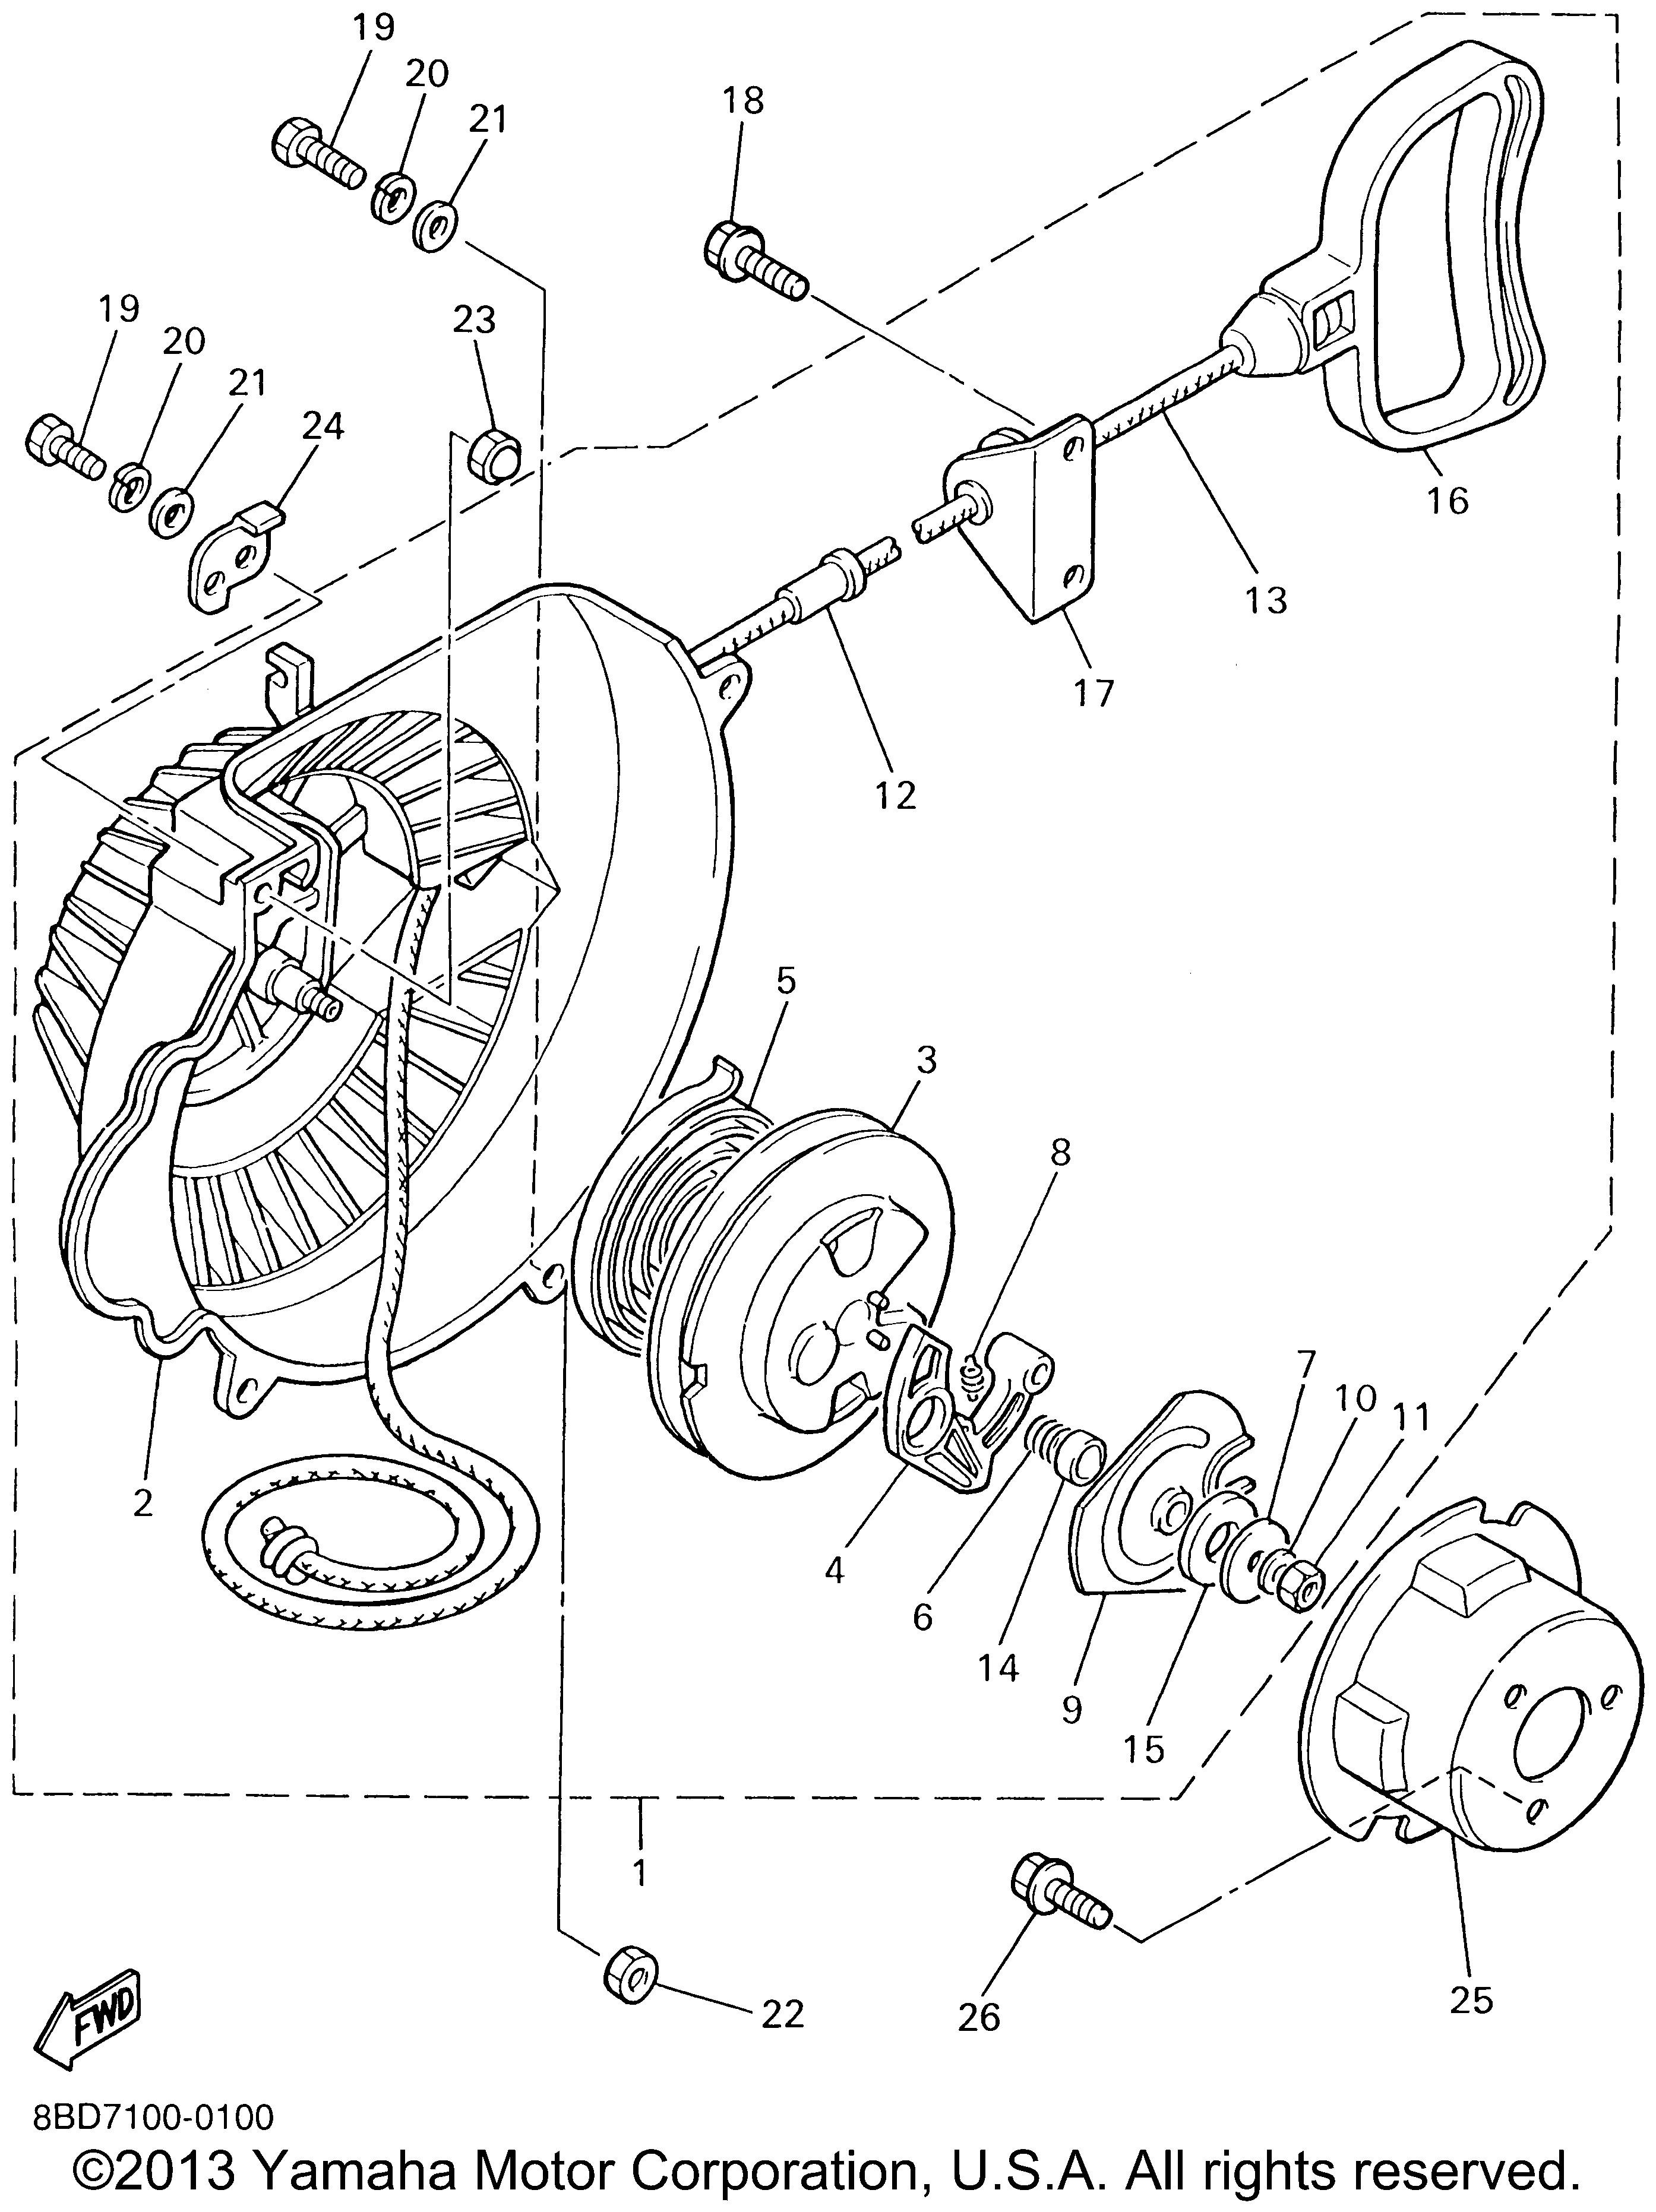 Kimpex Wireing Diagram